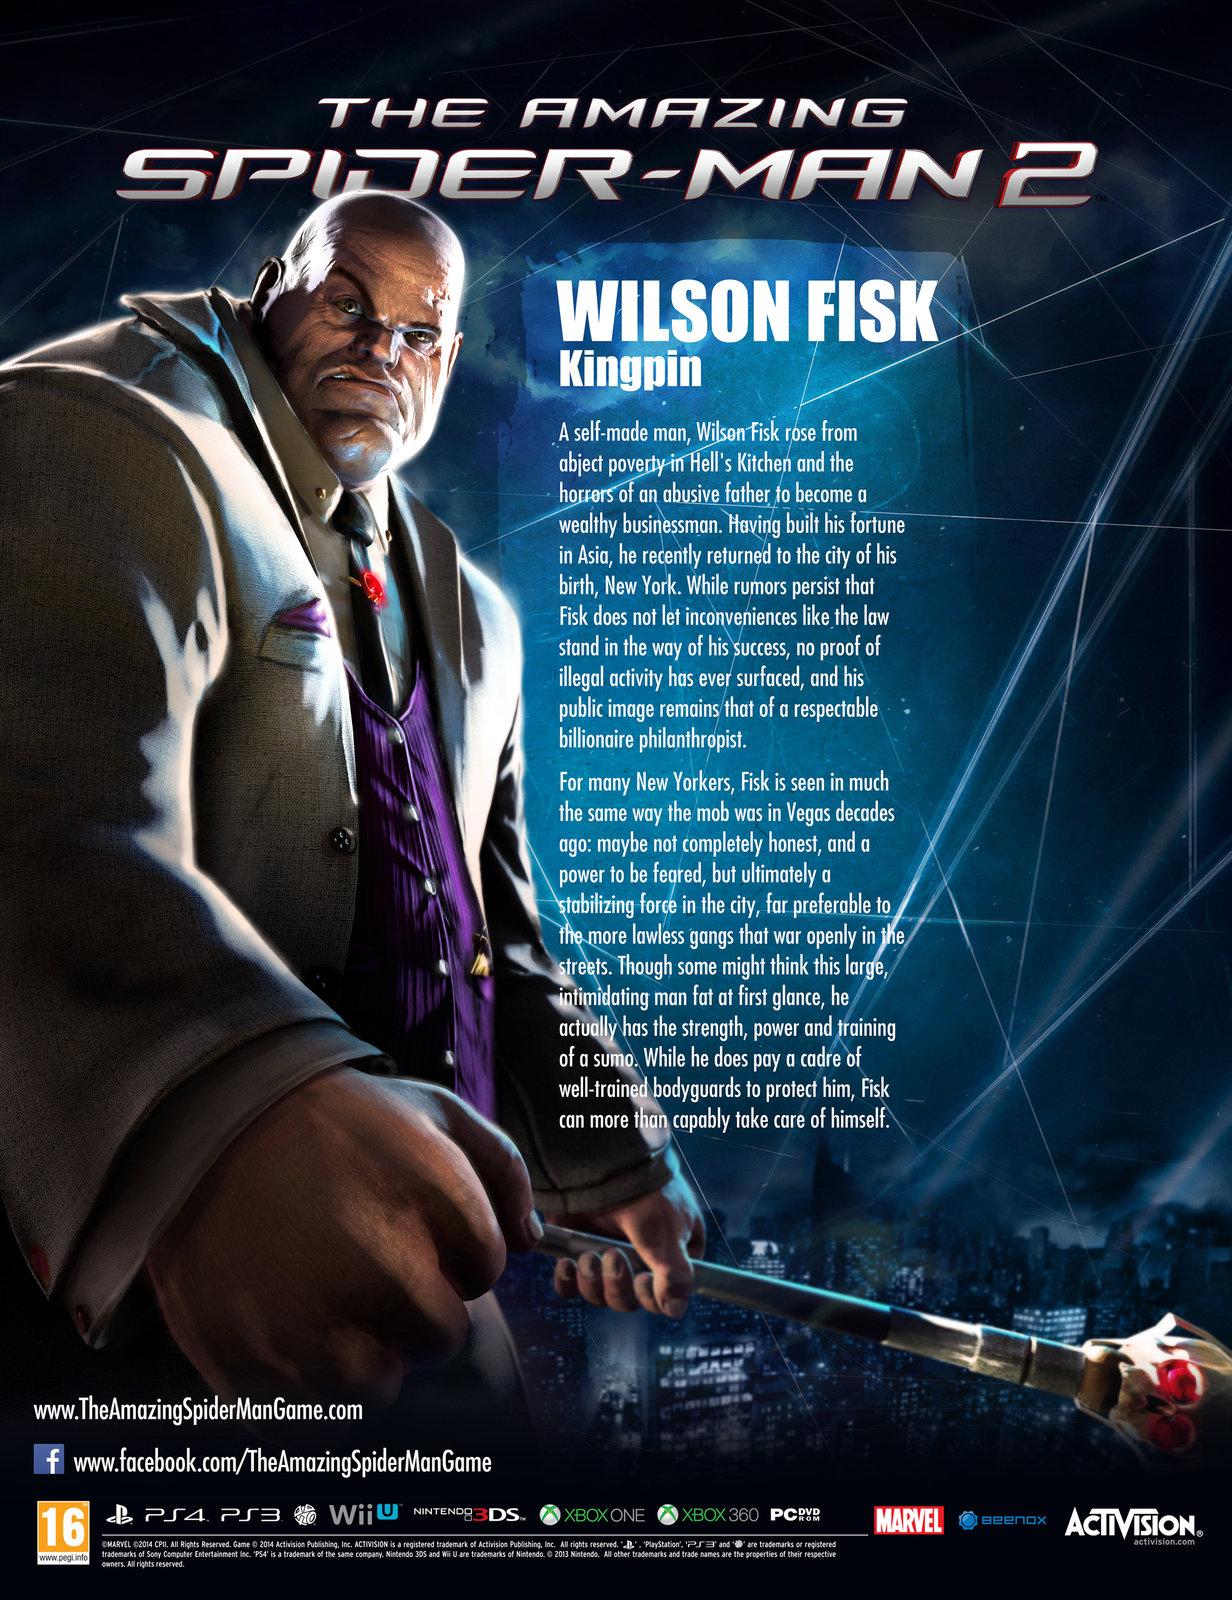 Spider man 2 video game villains securite casino de montreal